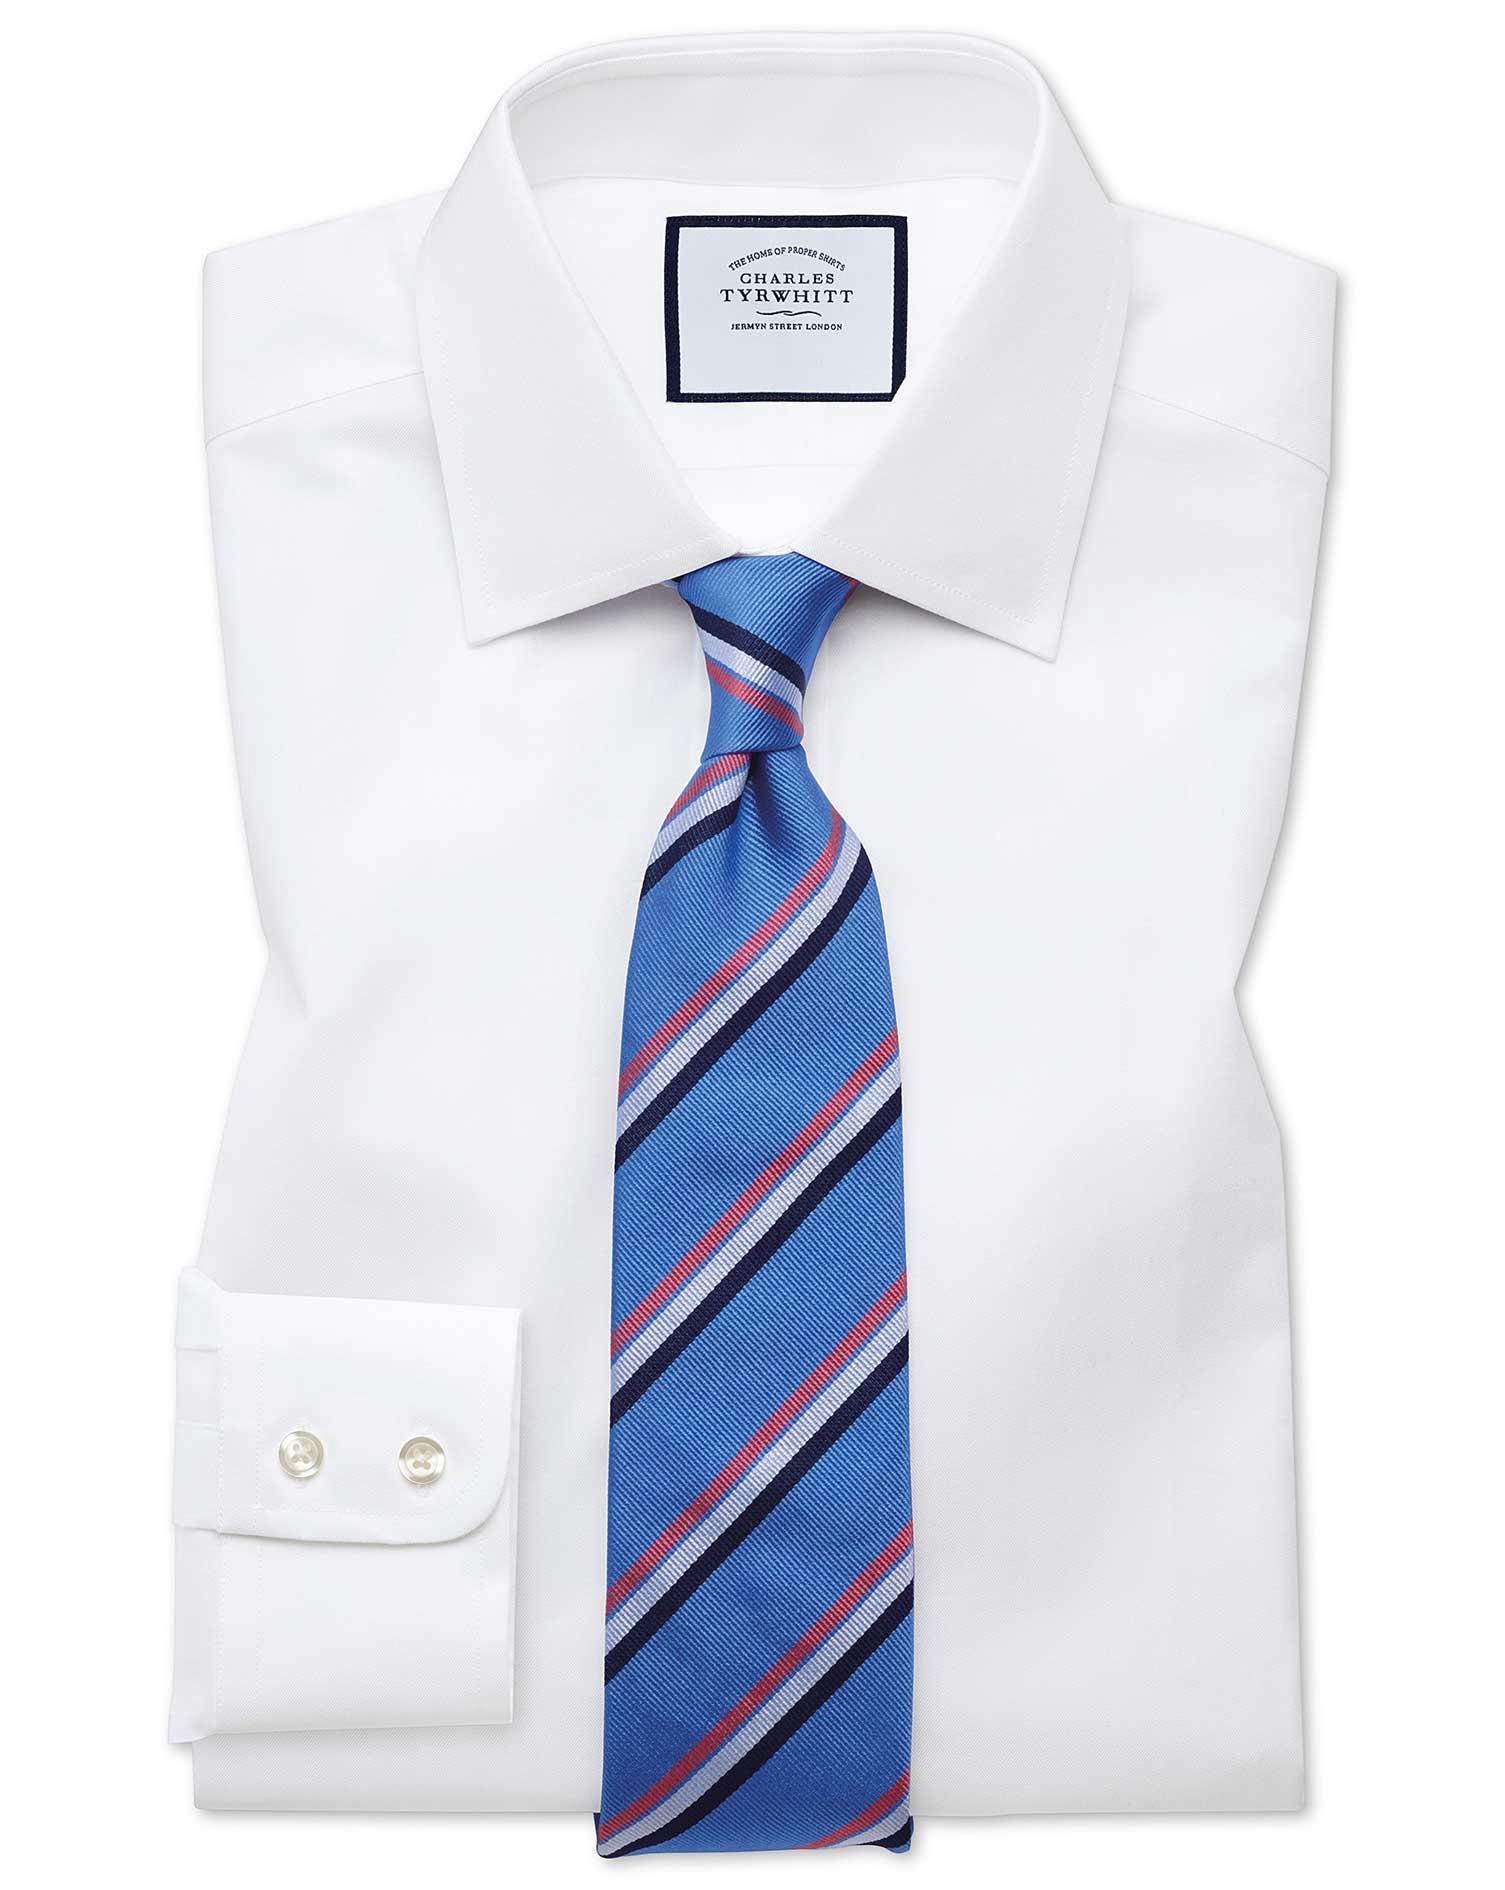 Slim Fit White Fine Herringbone Cotton Formal Shirt Single Cuff Size 16.5/35 by Charles Tyrwhitt